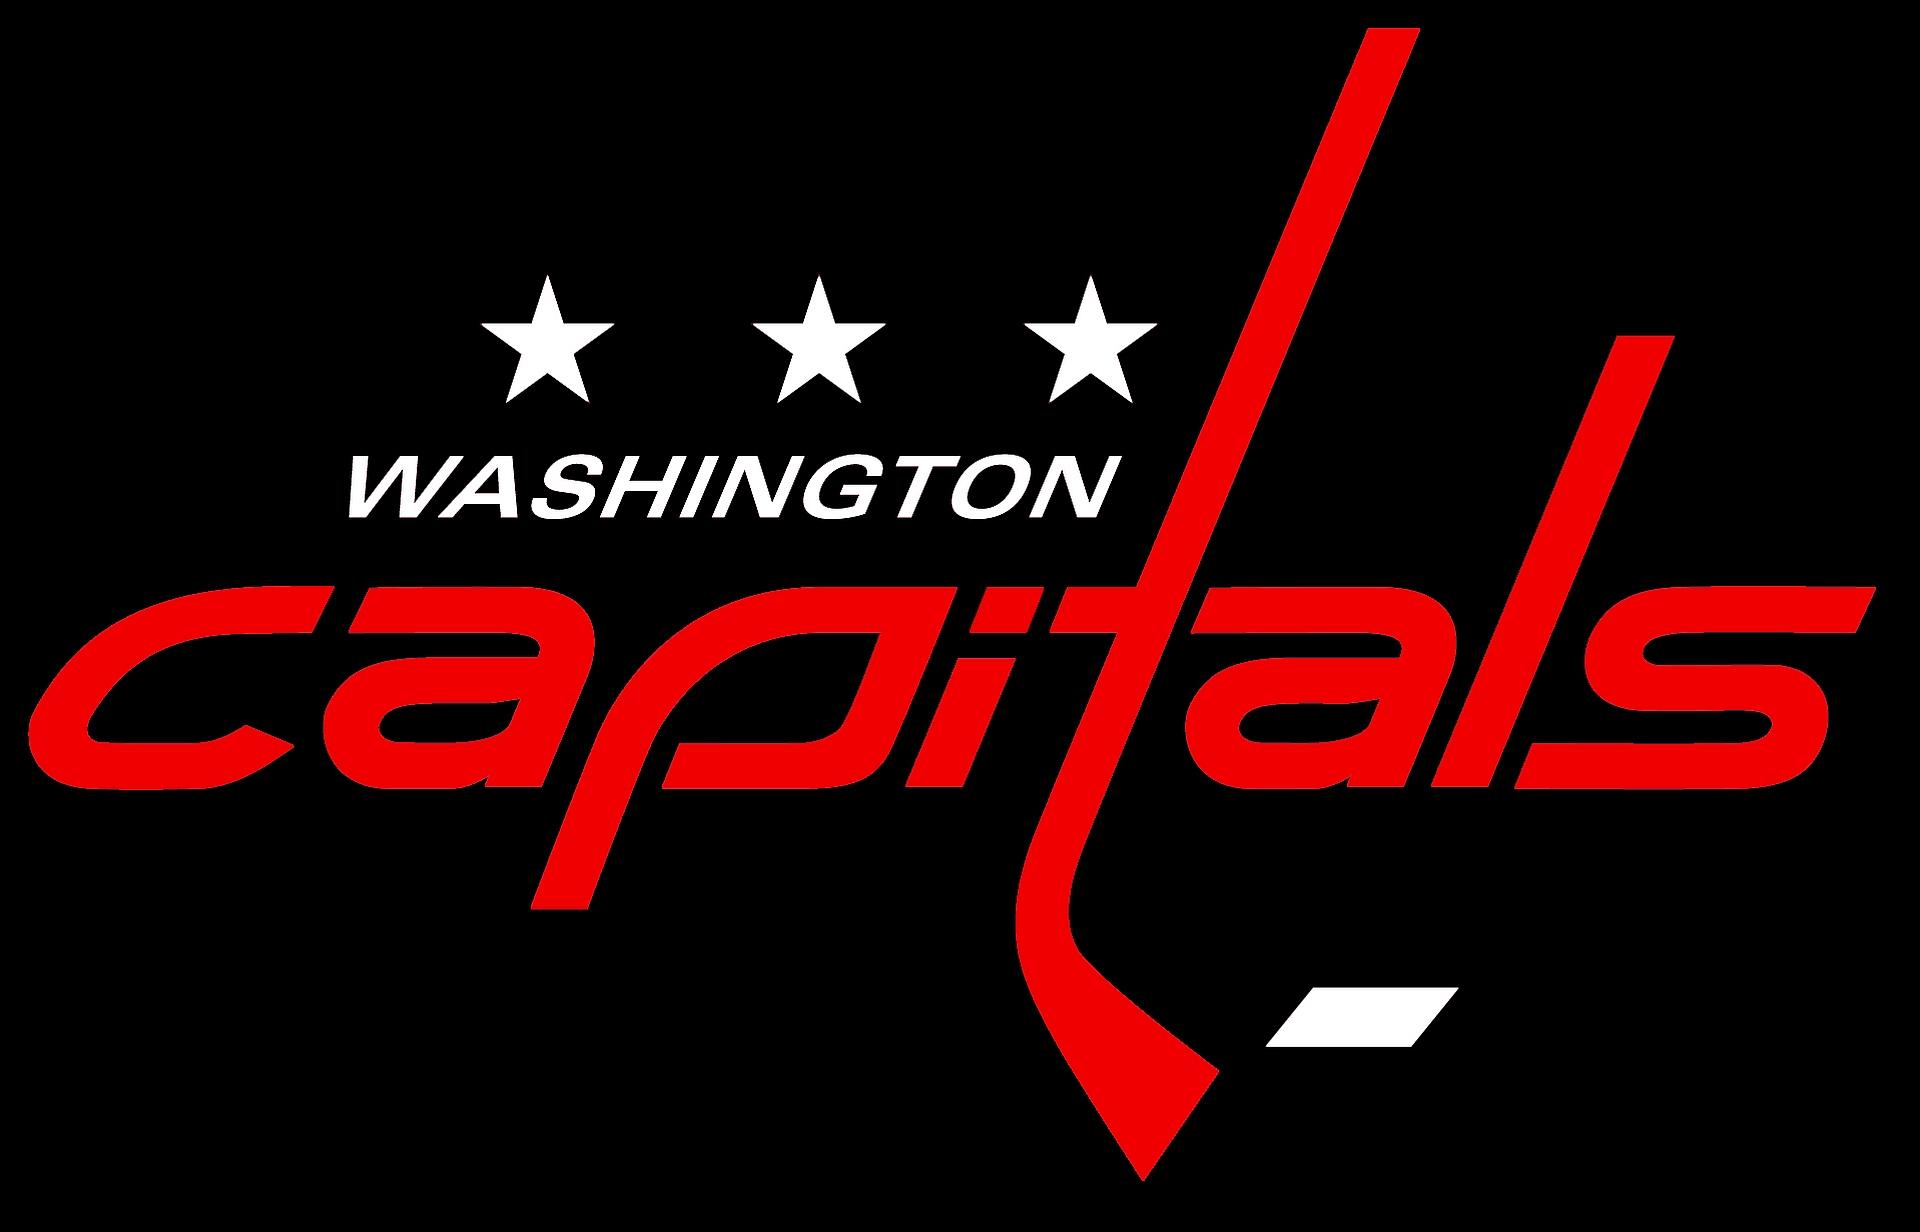 Washington Capitals HD Wallpaper Background Image 1920x1232 1920x1232